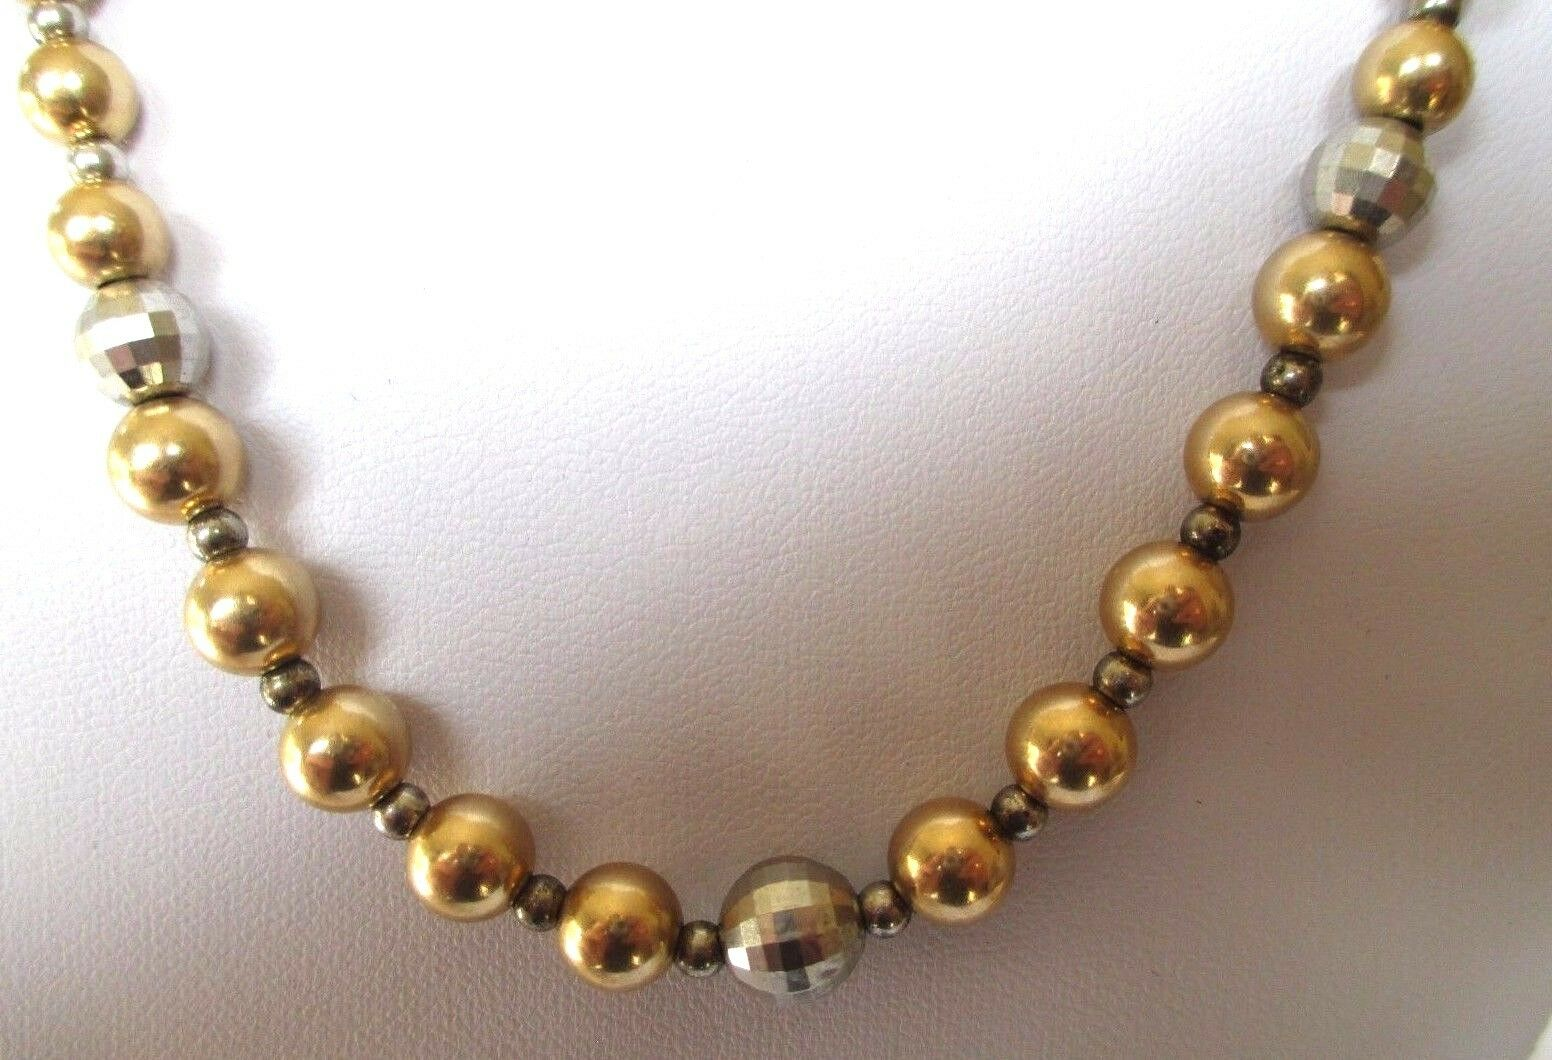 Collier bijou vintage attache silver 925 poinçon perles vermeil or et silver 191